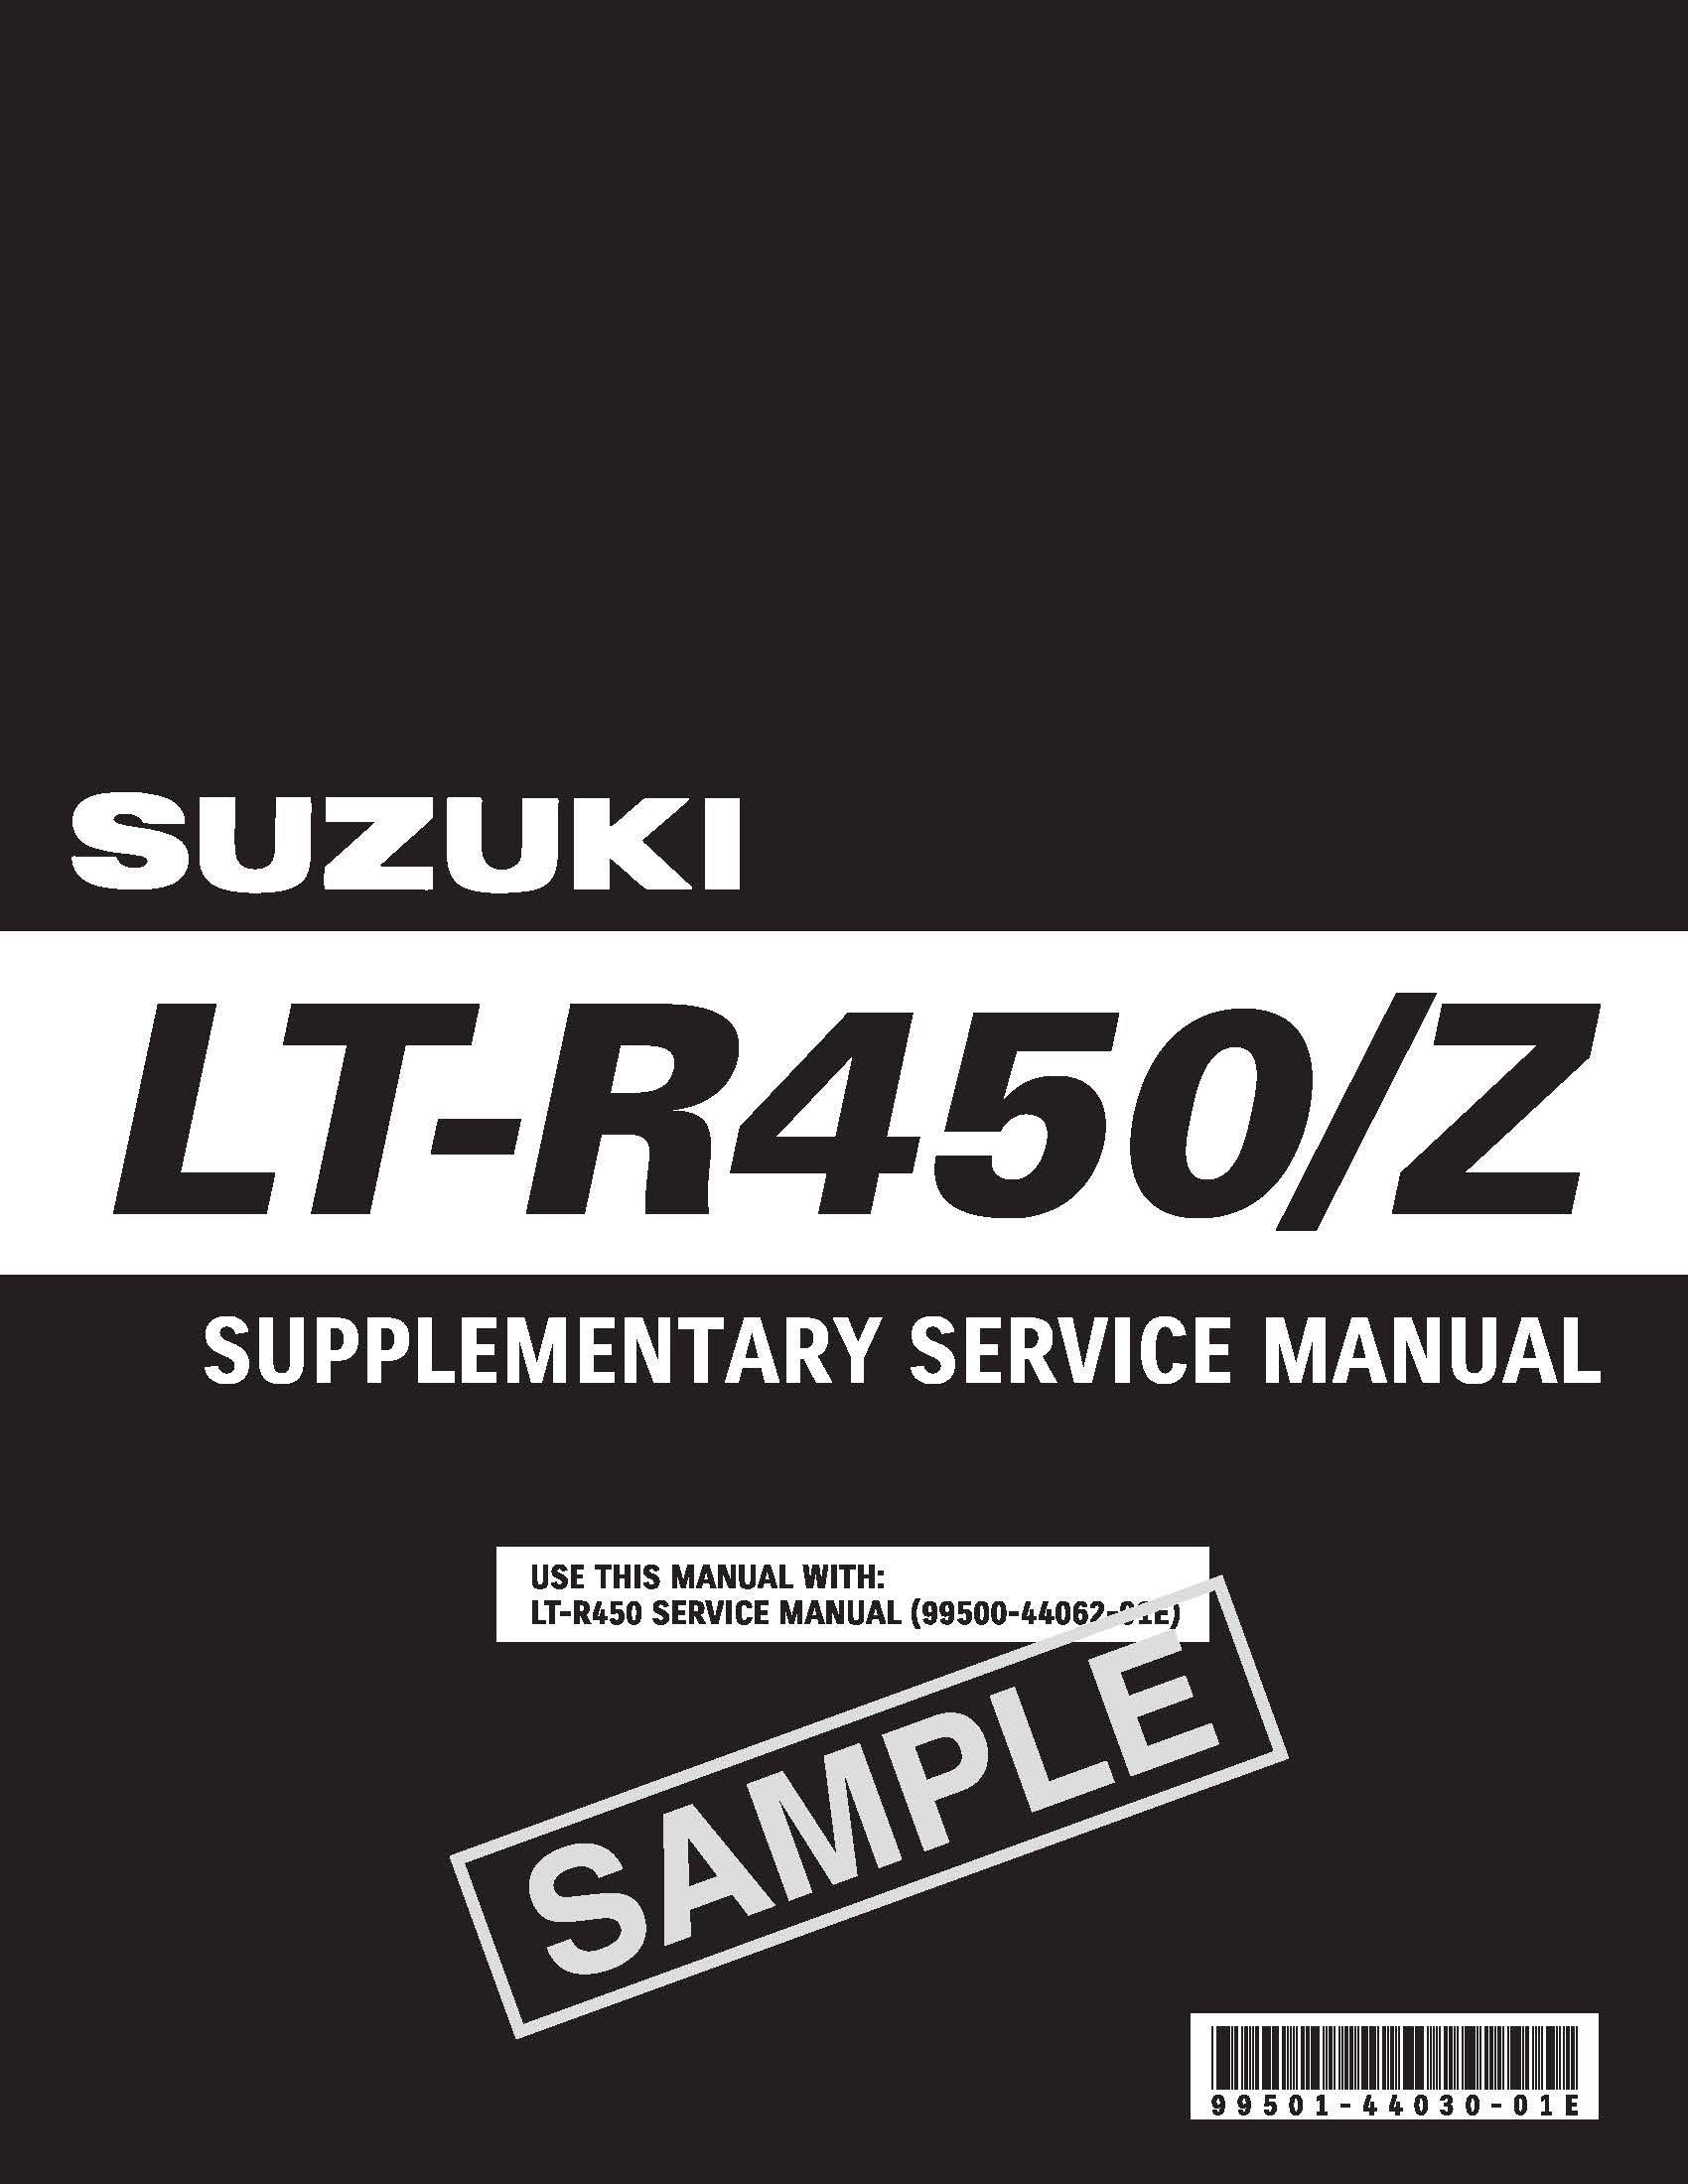 2009 Suzuki QuadRacer LT-R450 Supplement Service Manual